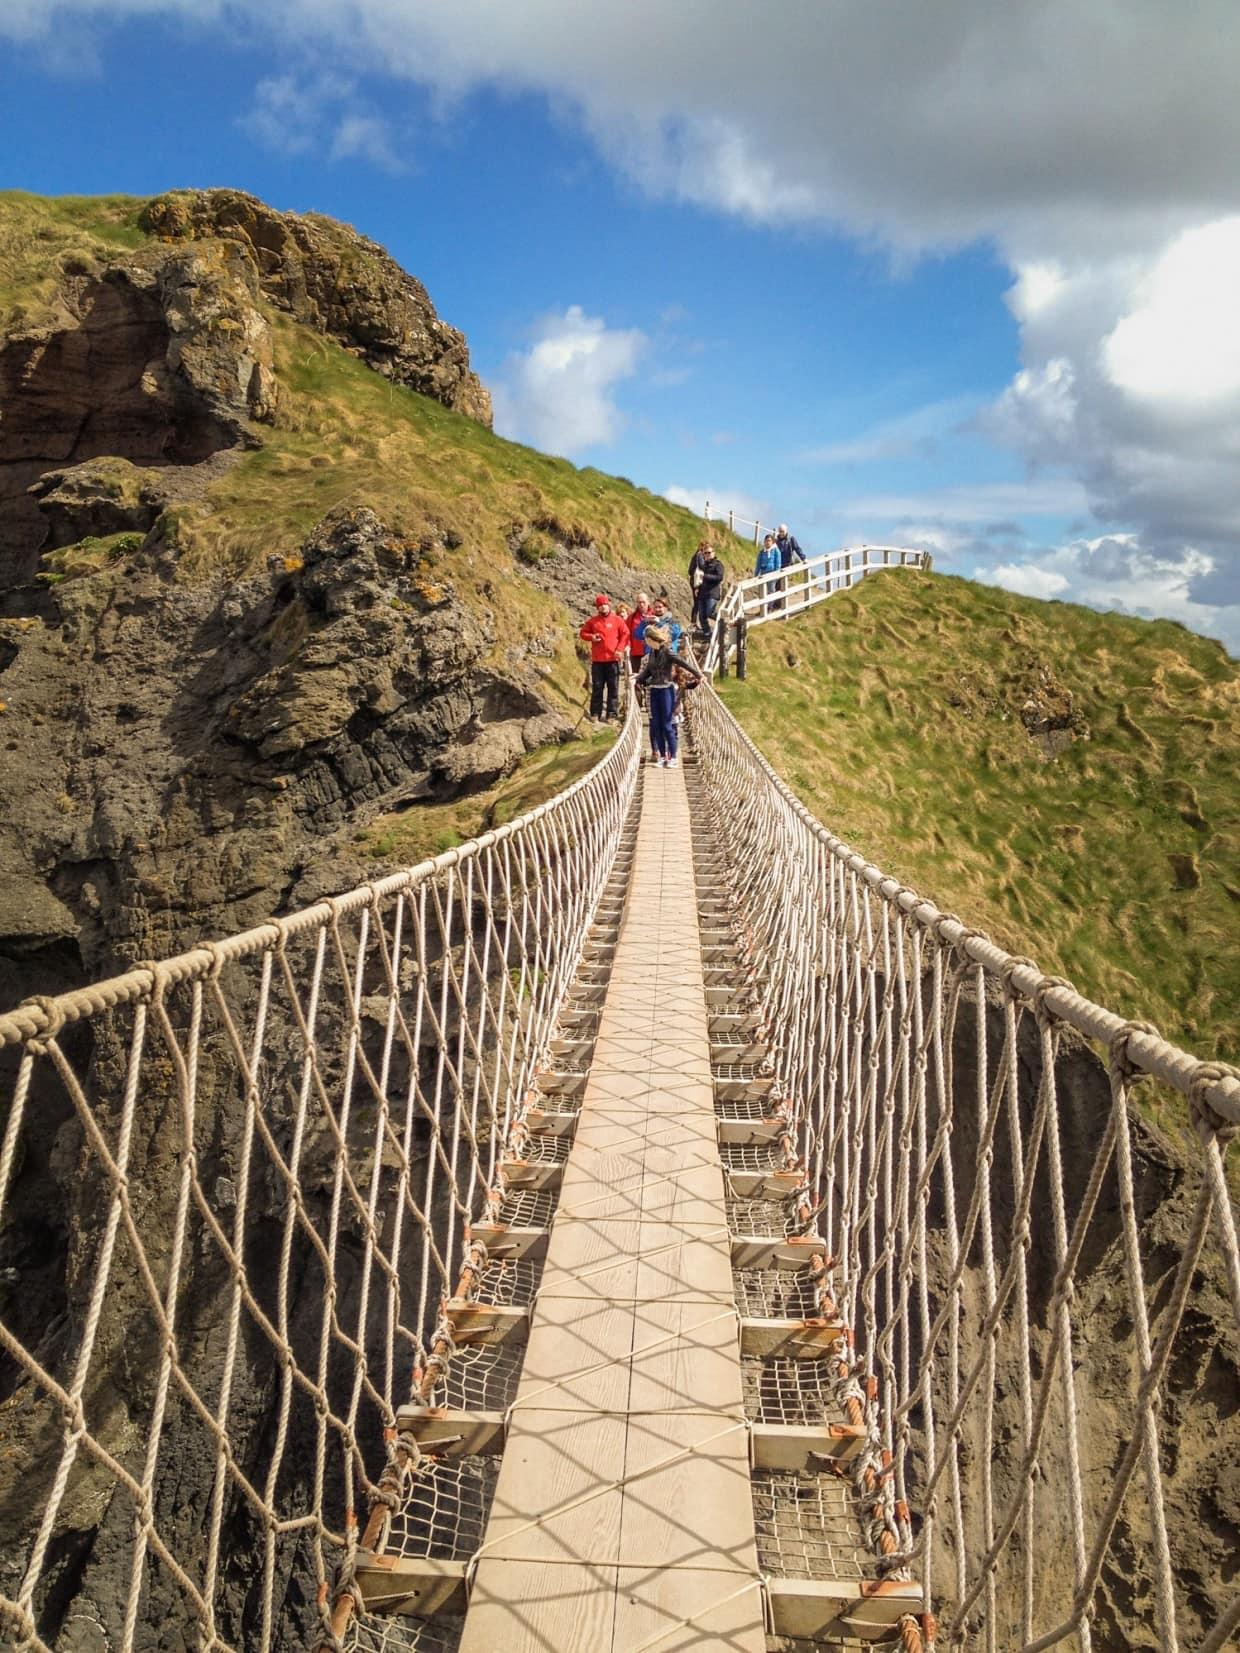 Carrick-a-rede suspension bridge